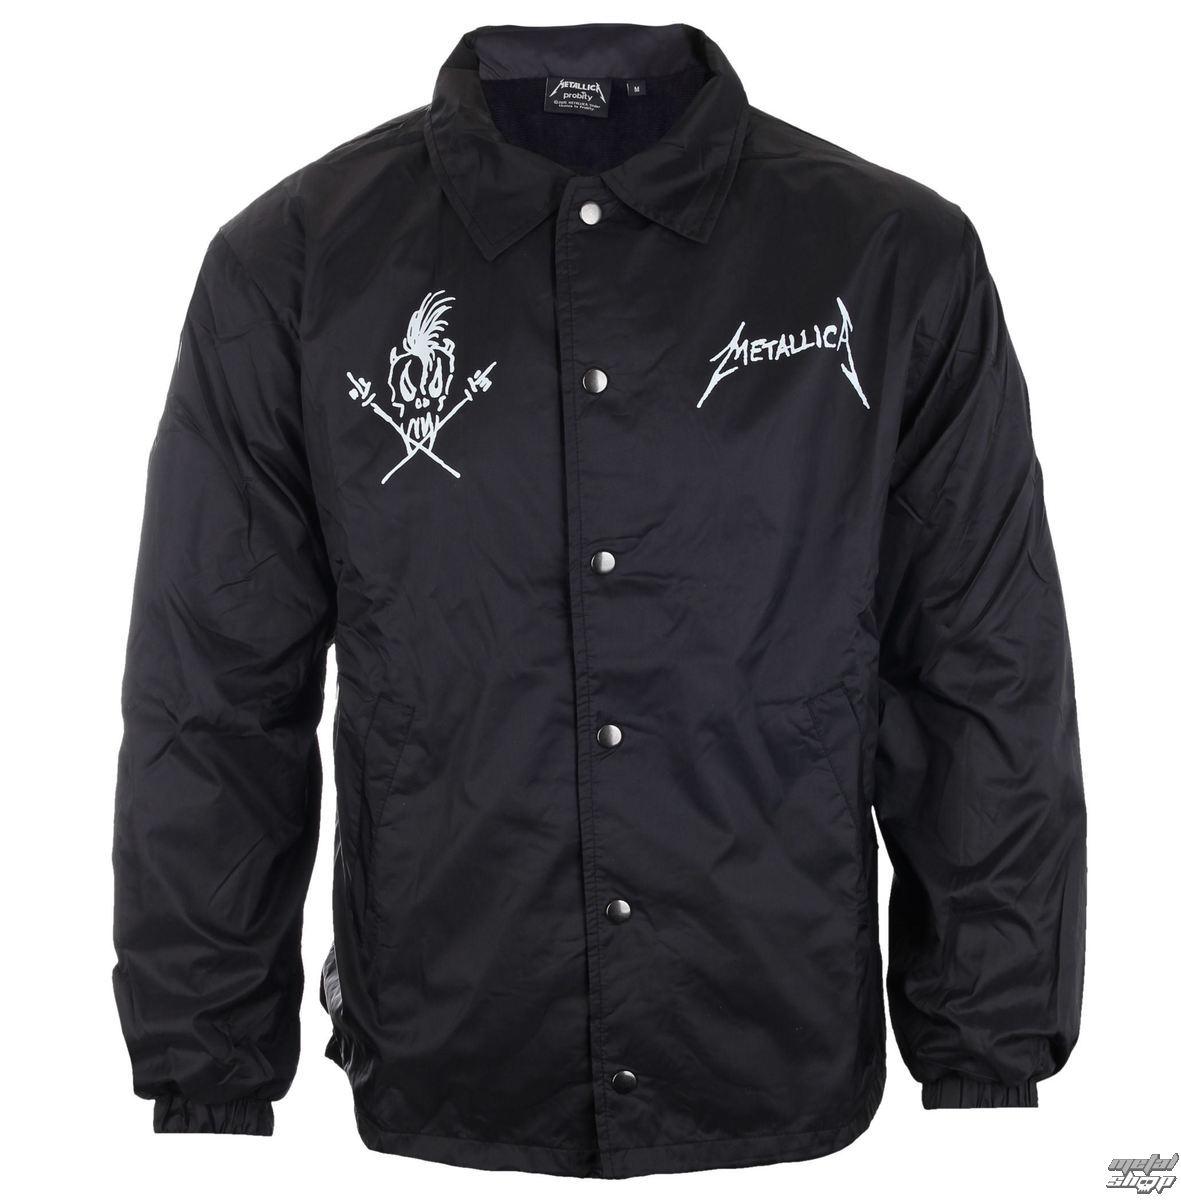 a6d307591e4 jacket men spring fall Metallica - Scary Guy - Black- ATMOSPHERE - PRO050 -  metal-shop.eu